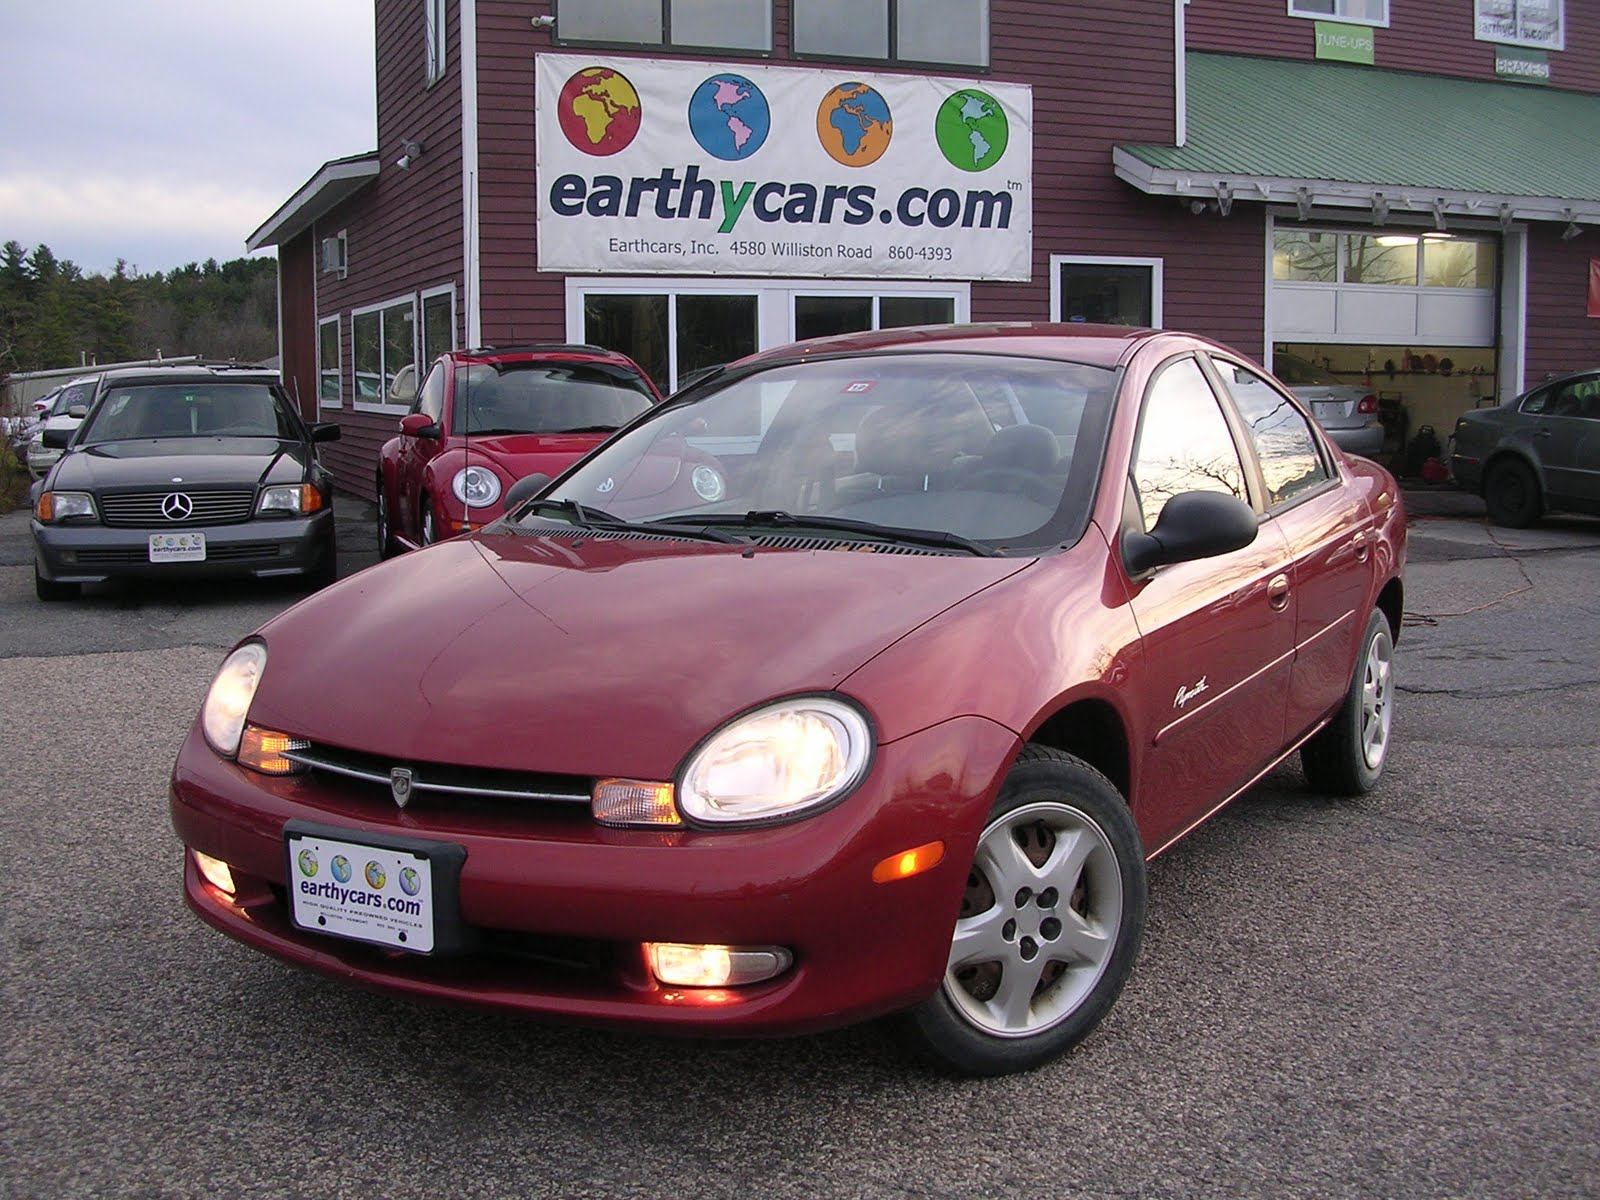 2000 Dodge/Plymouth Neon, Red, Sedan, 28747 mi, $5,900 http://bit.ly ...